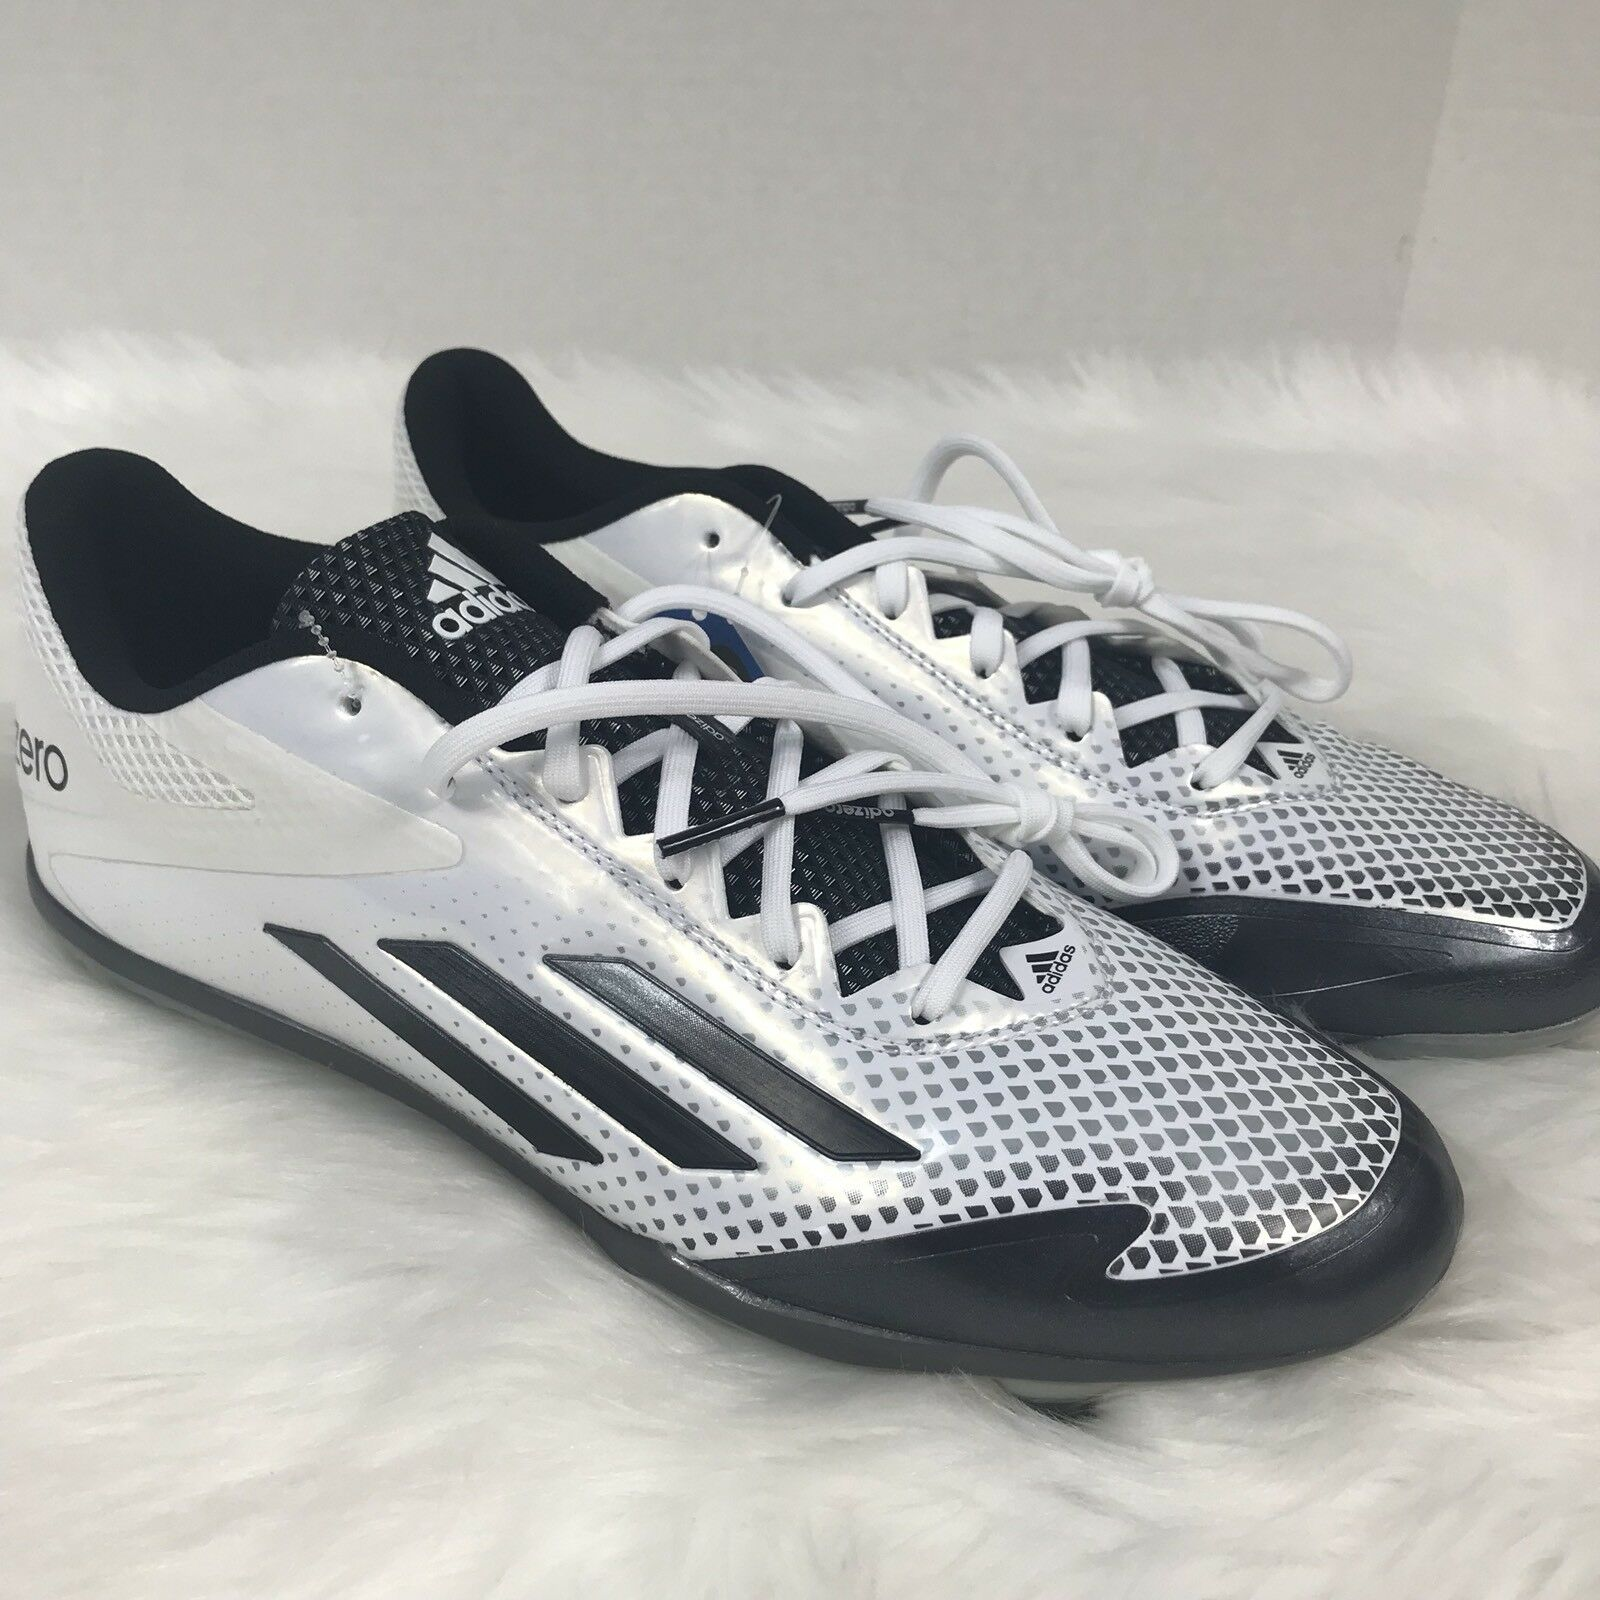 697f02e50 ADIDAS Adizero Afterburner 2.0 Metal Baseball Cleats shoes White S85704  Size 11.5